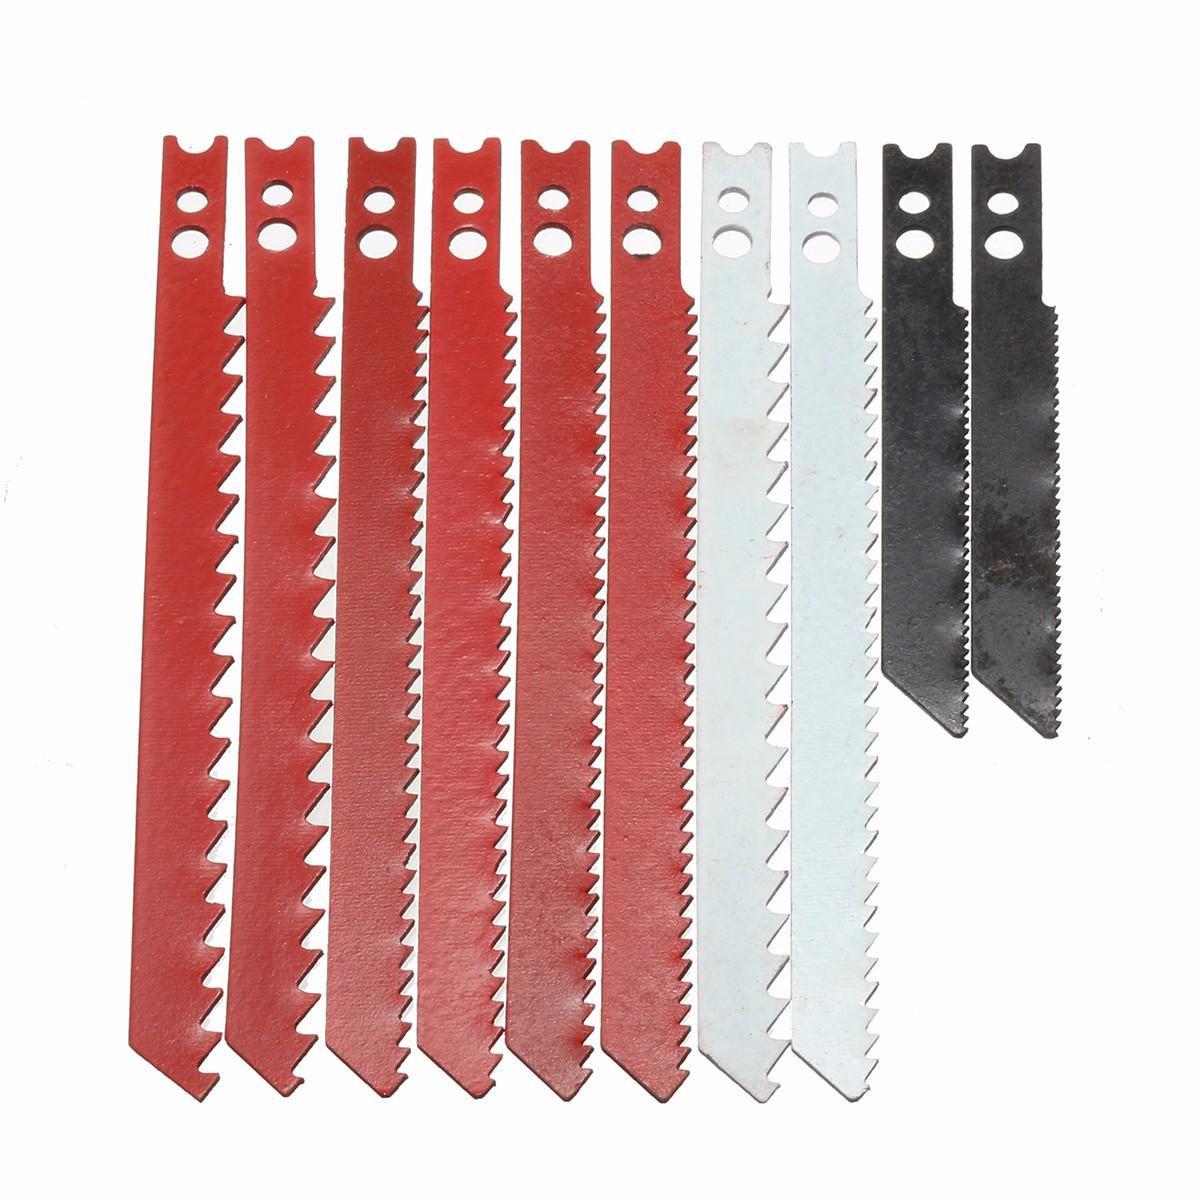 10pcs Saw Blade Set for Black and Decker Jigsaw Metal Plastic Wood Blades